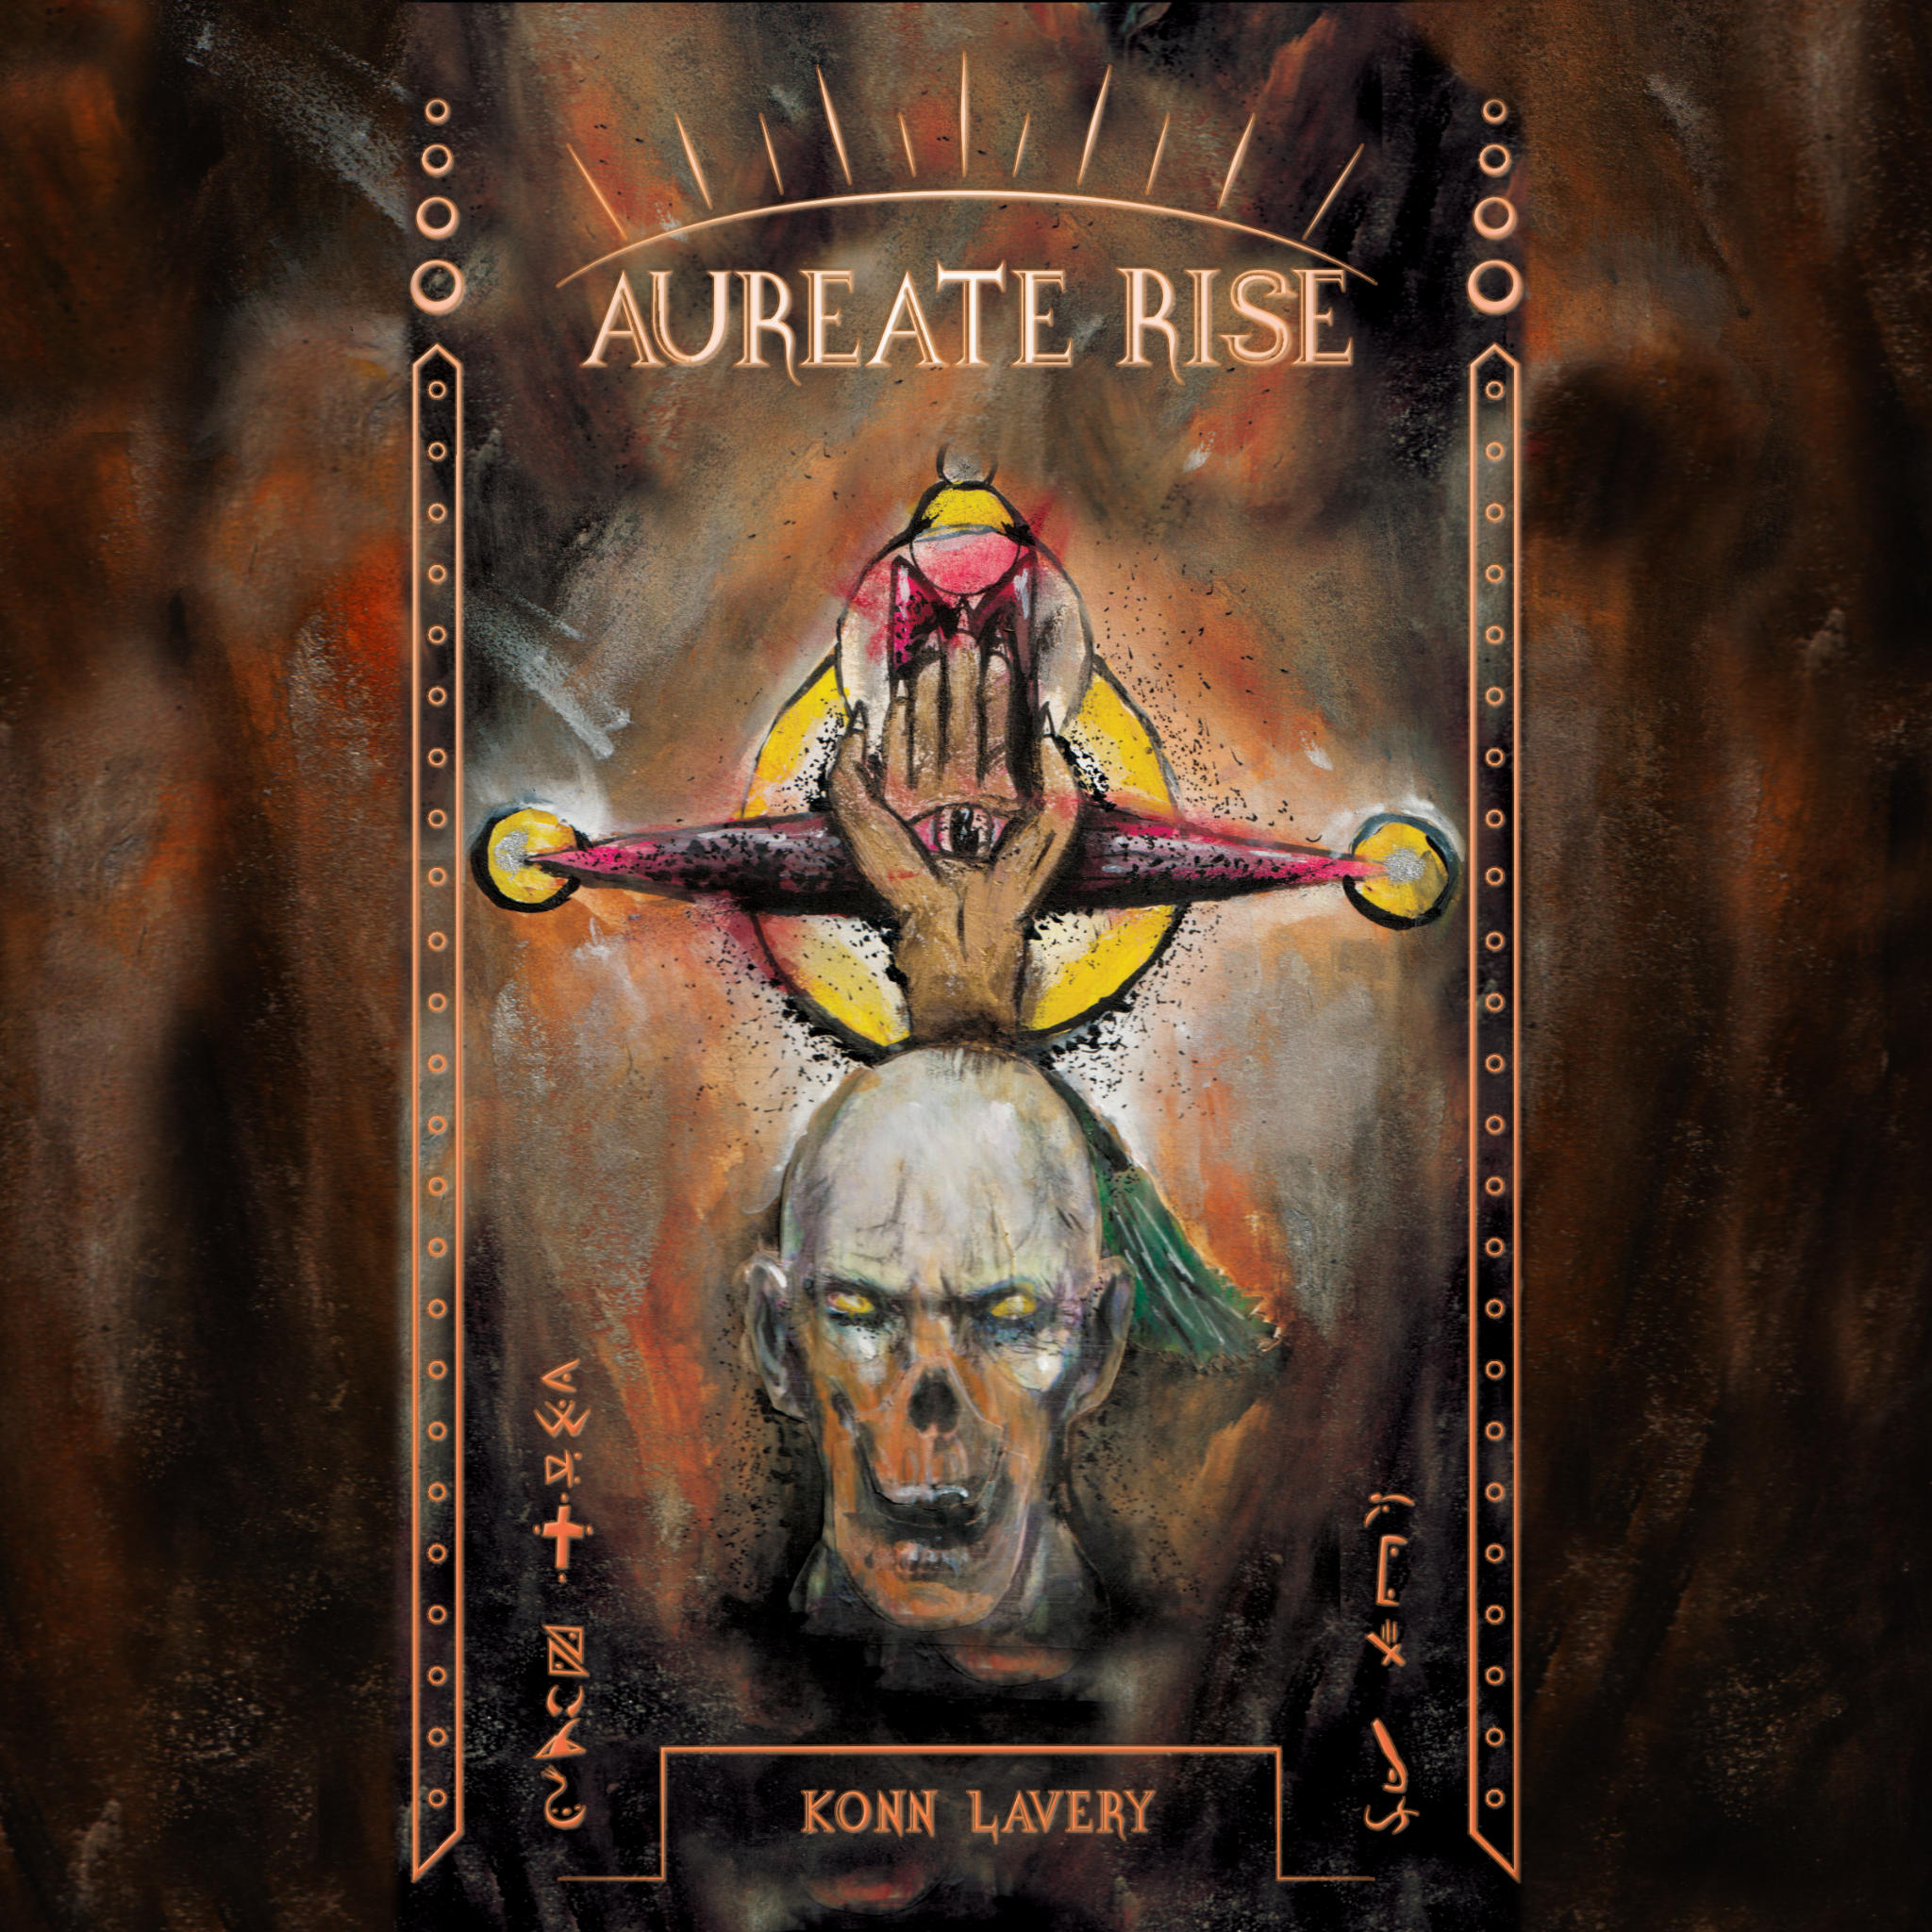 Aureate Rise by Konn Lavery